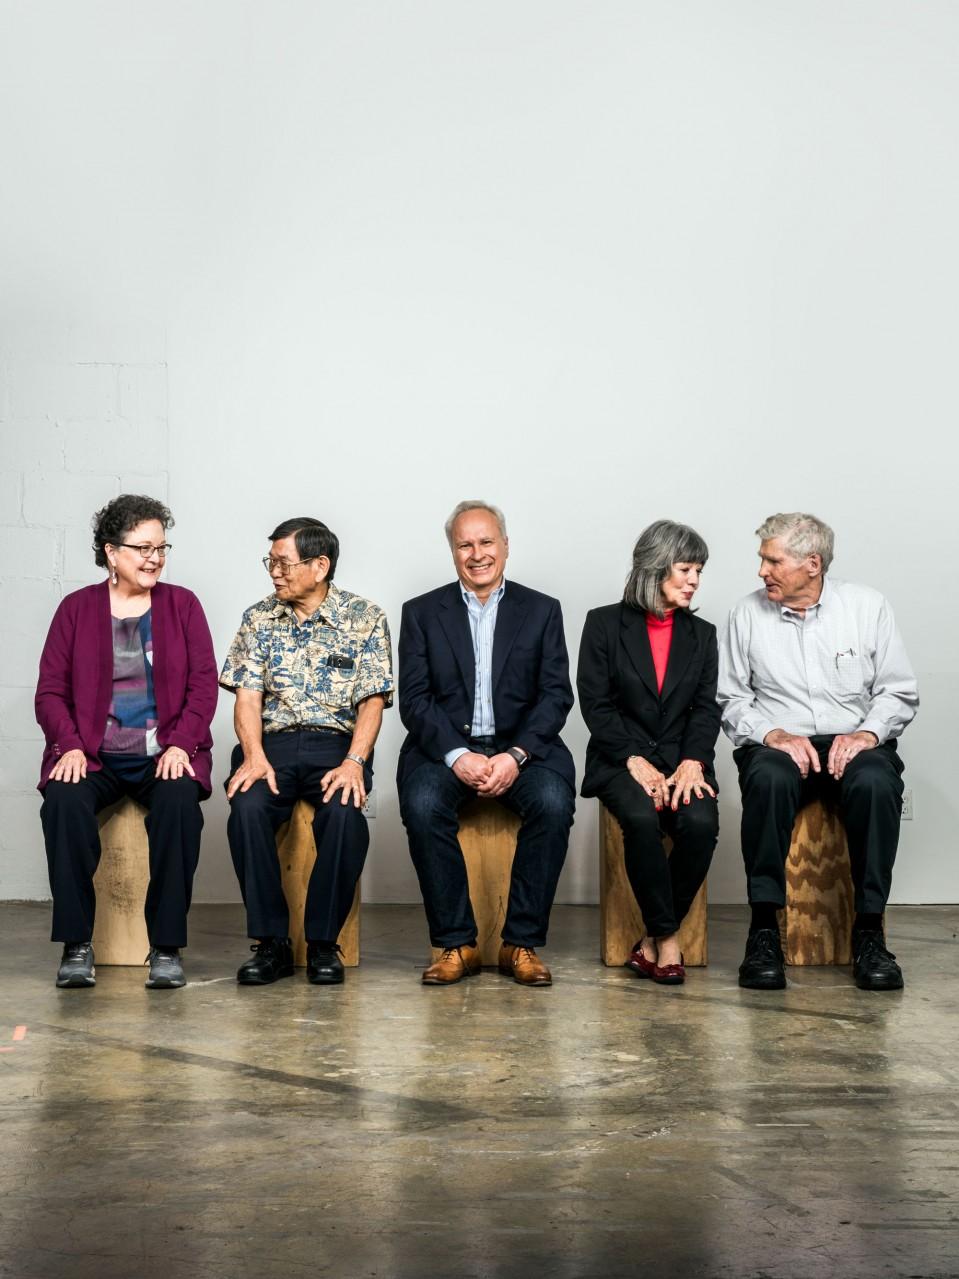 Image of seniors from Longevity explorers